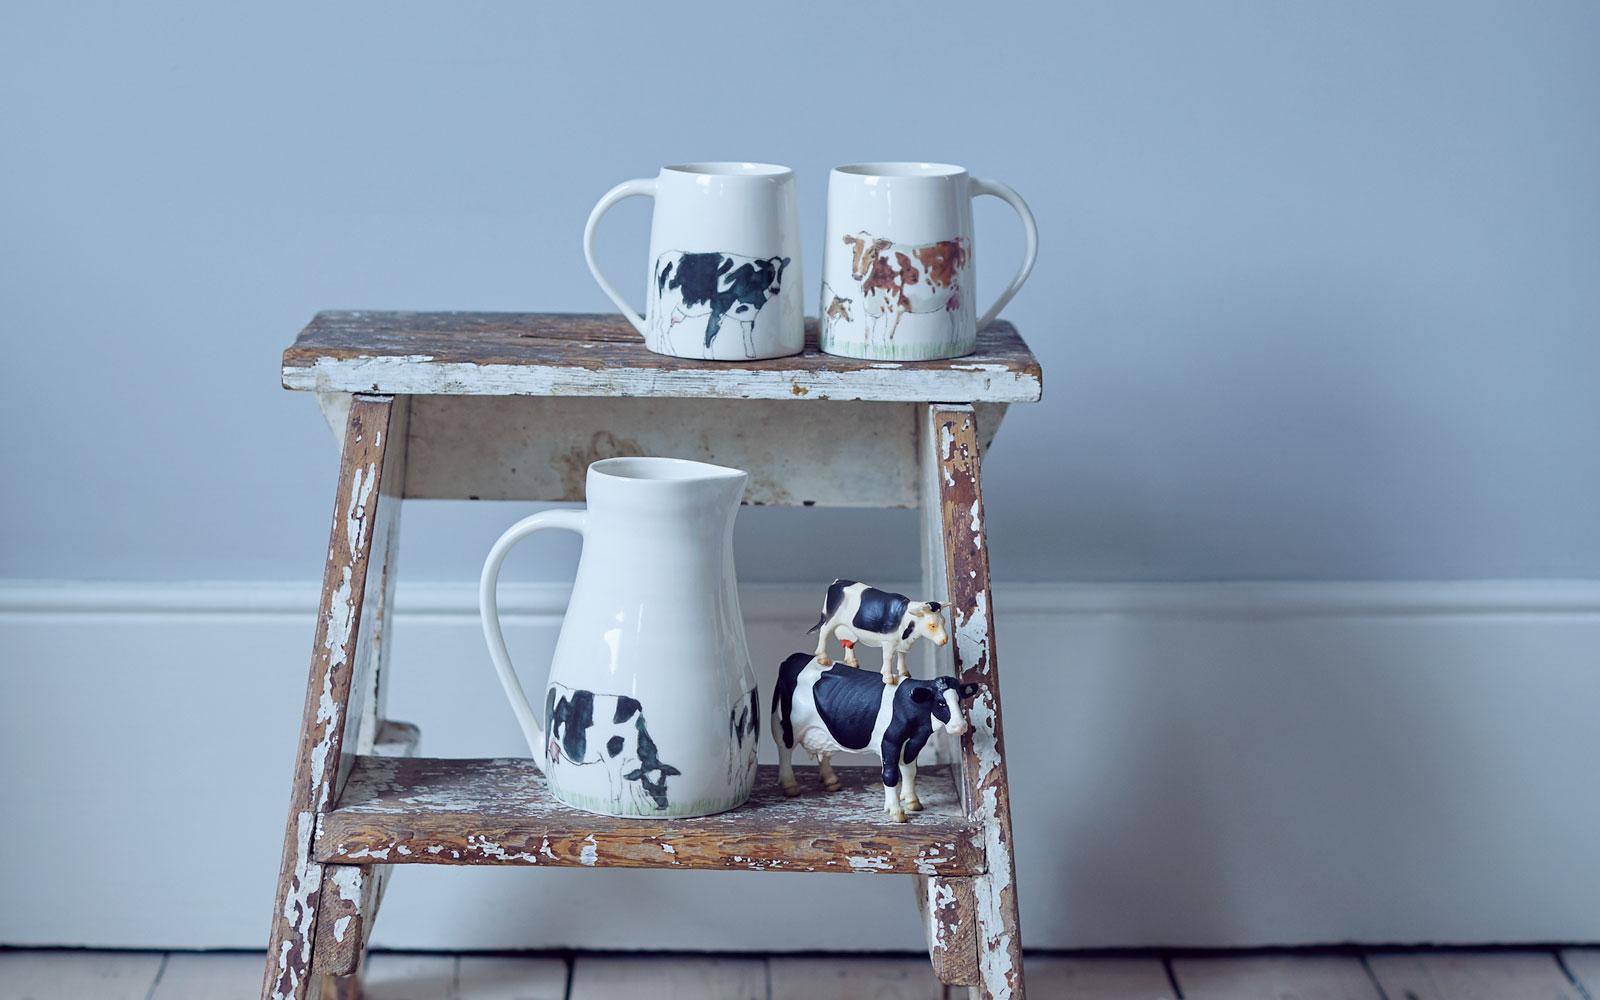 FI-helen-beard-milk-jug-tea-mugs05.jpg